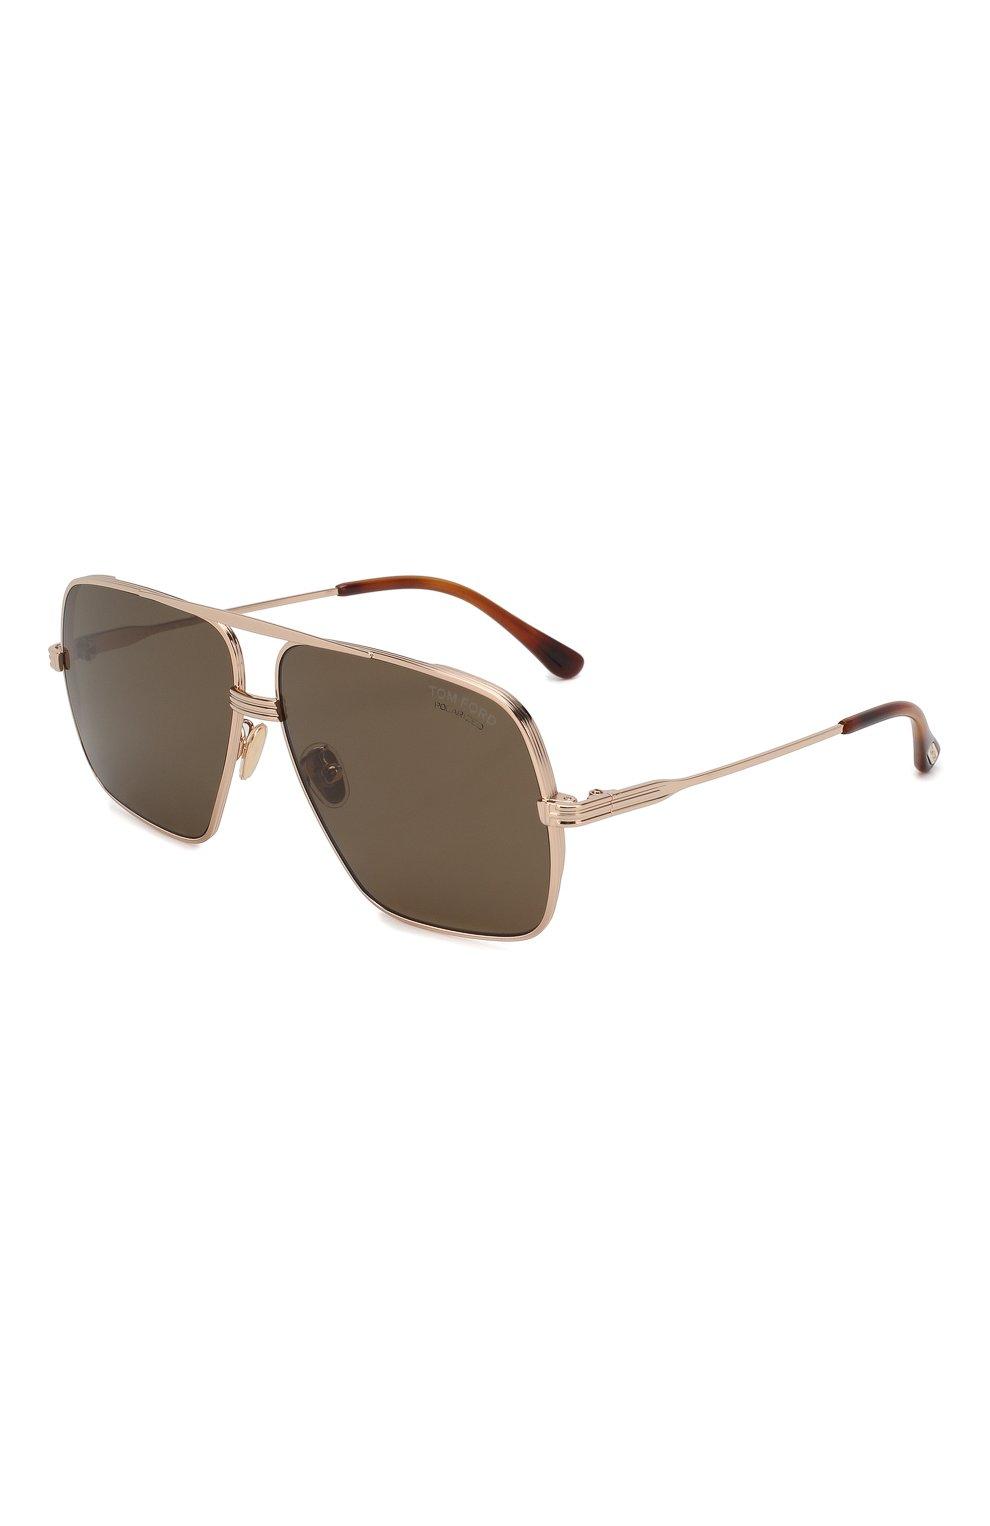 Мужские солнцезащитные очки TOM FORD золотого цвета, арт. TF735-H 28M   Фото 1